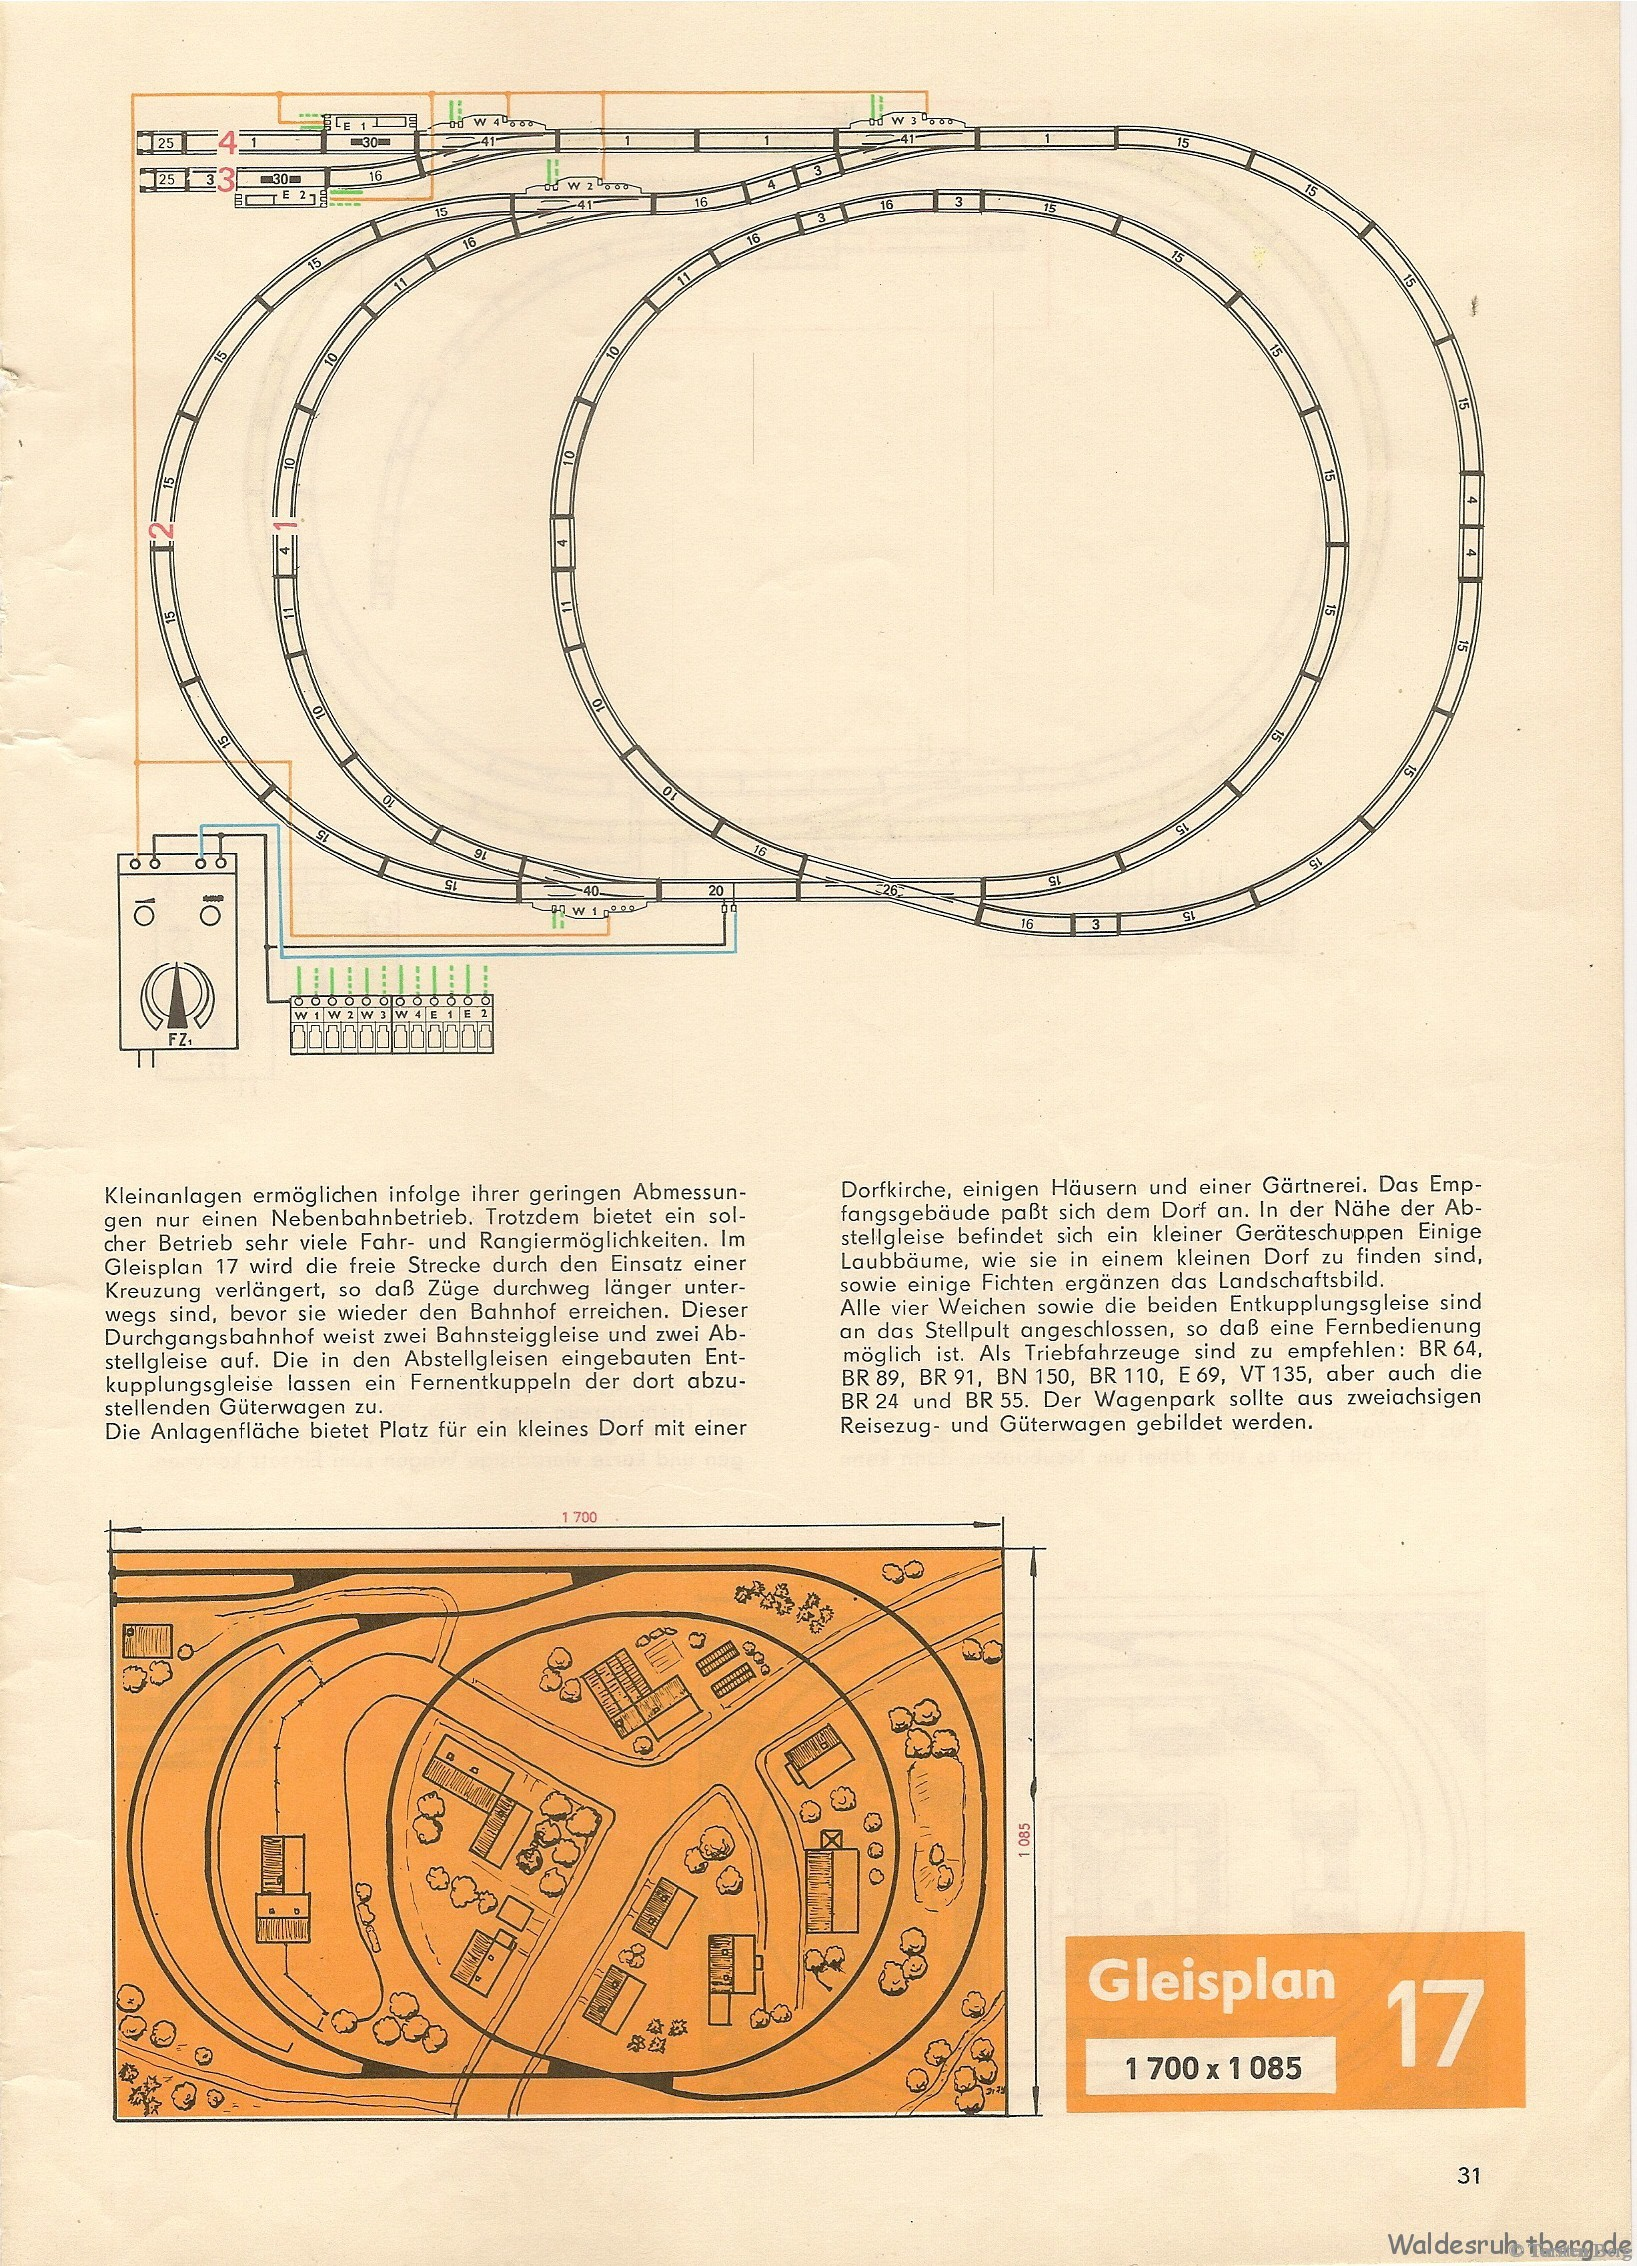 32 PIKO Standardgleis-Gleisplan 17